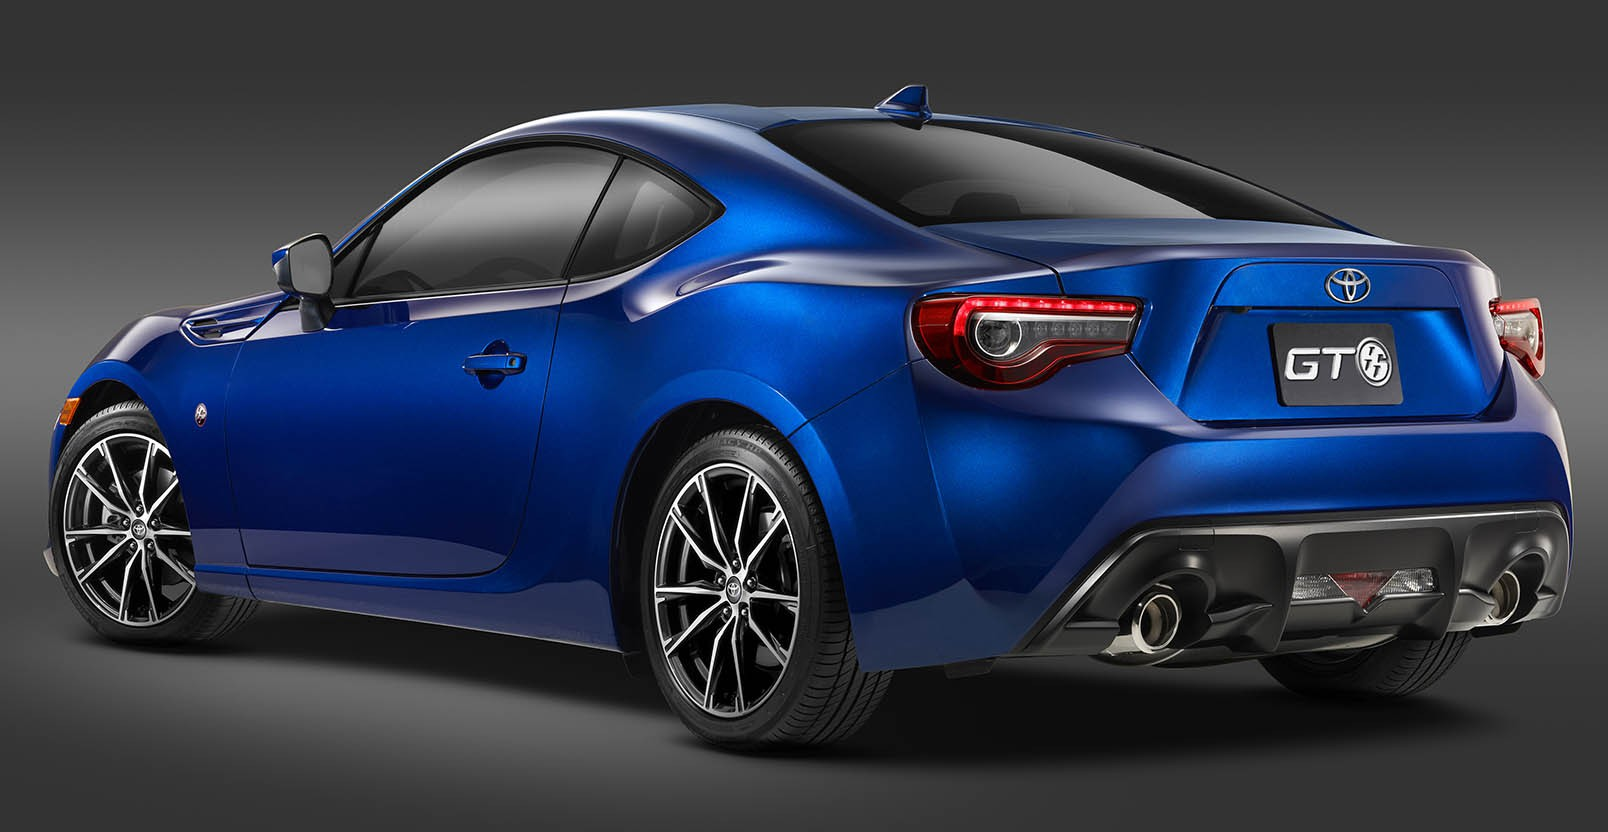 02-Toyota-GT86-17032016